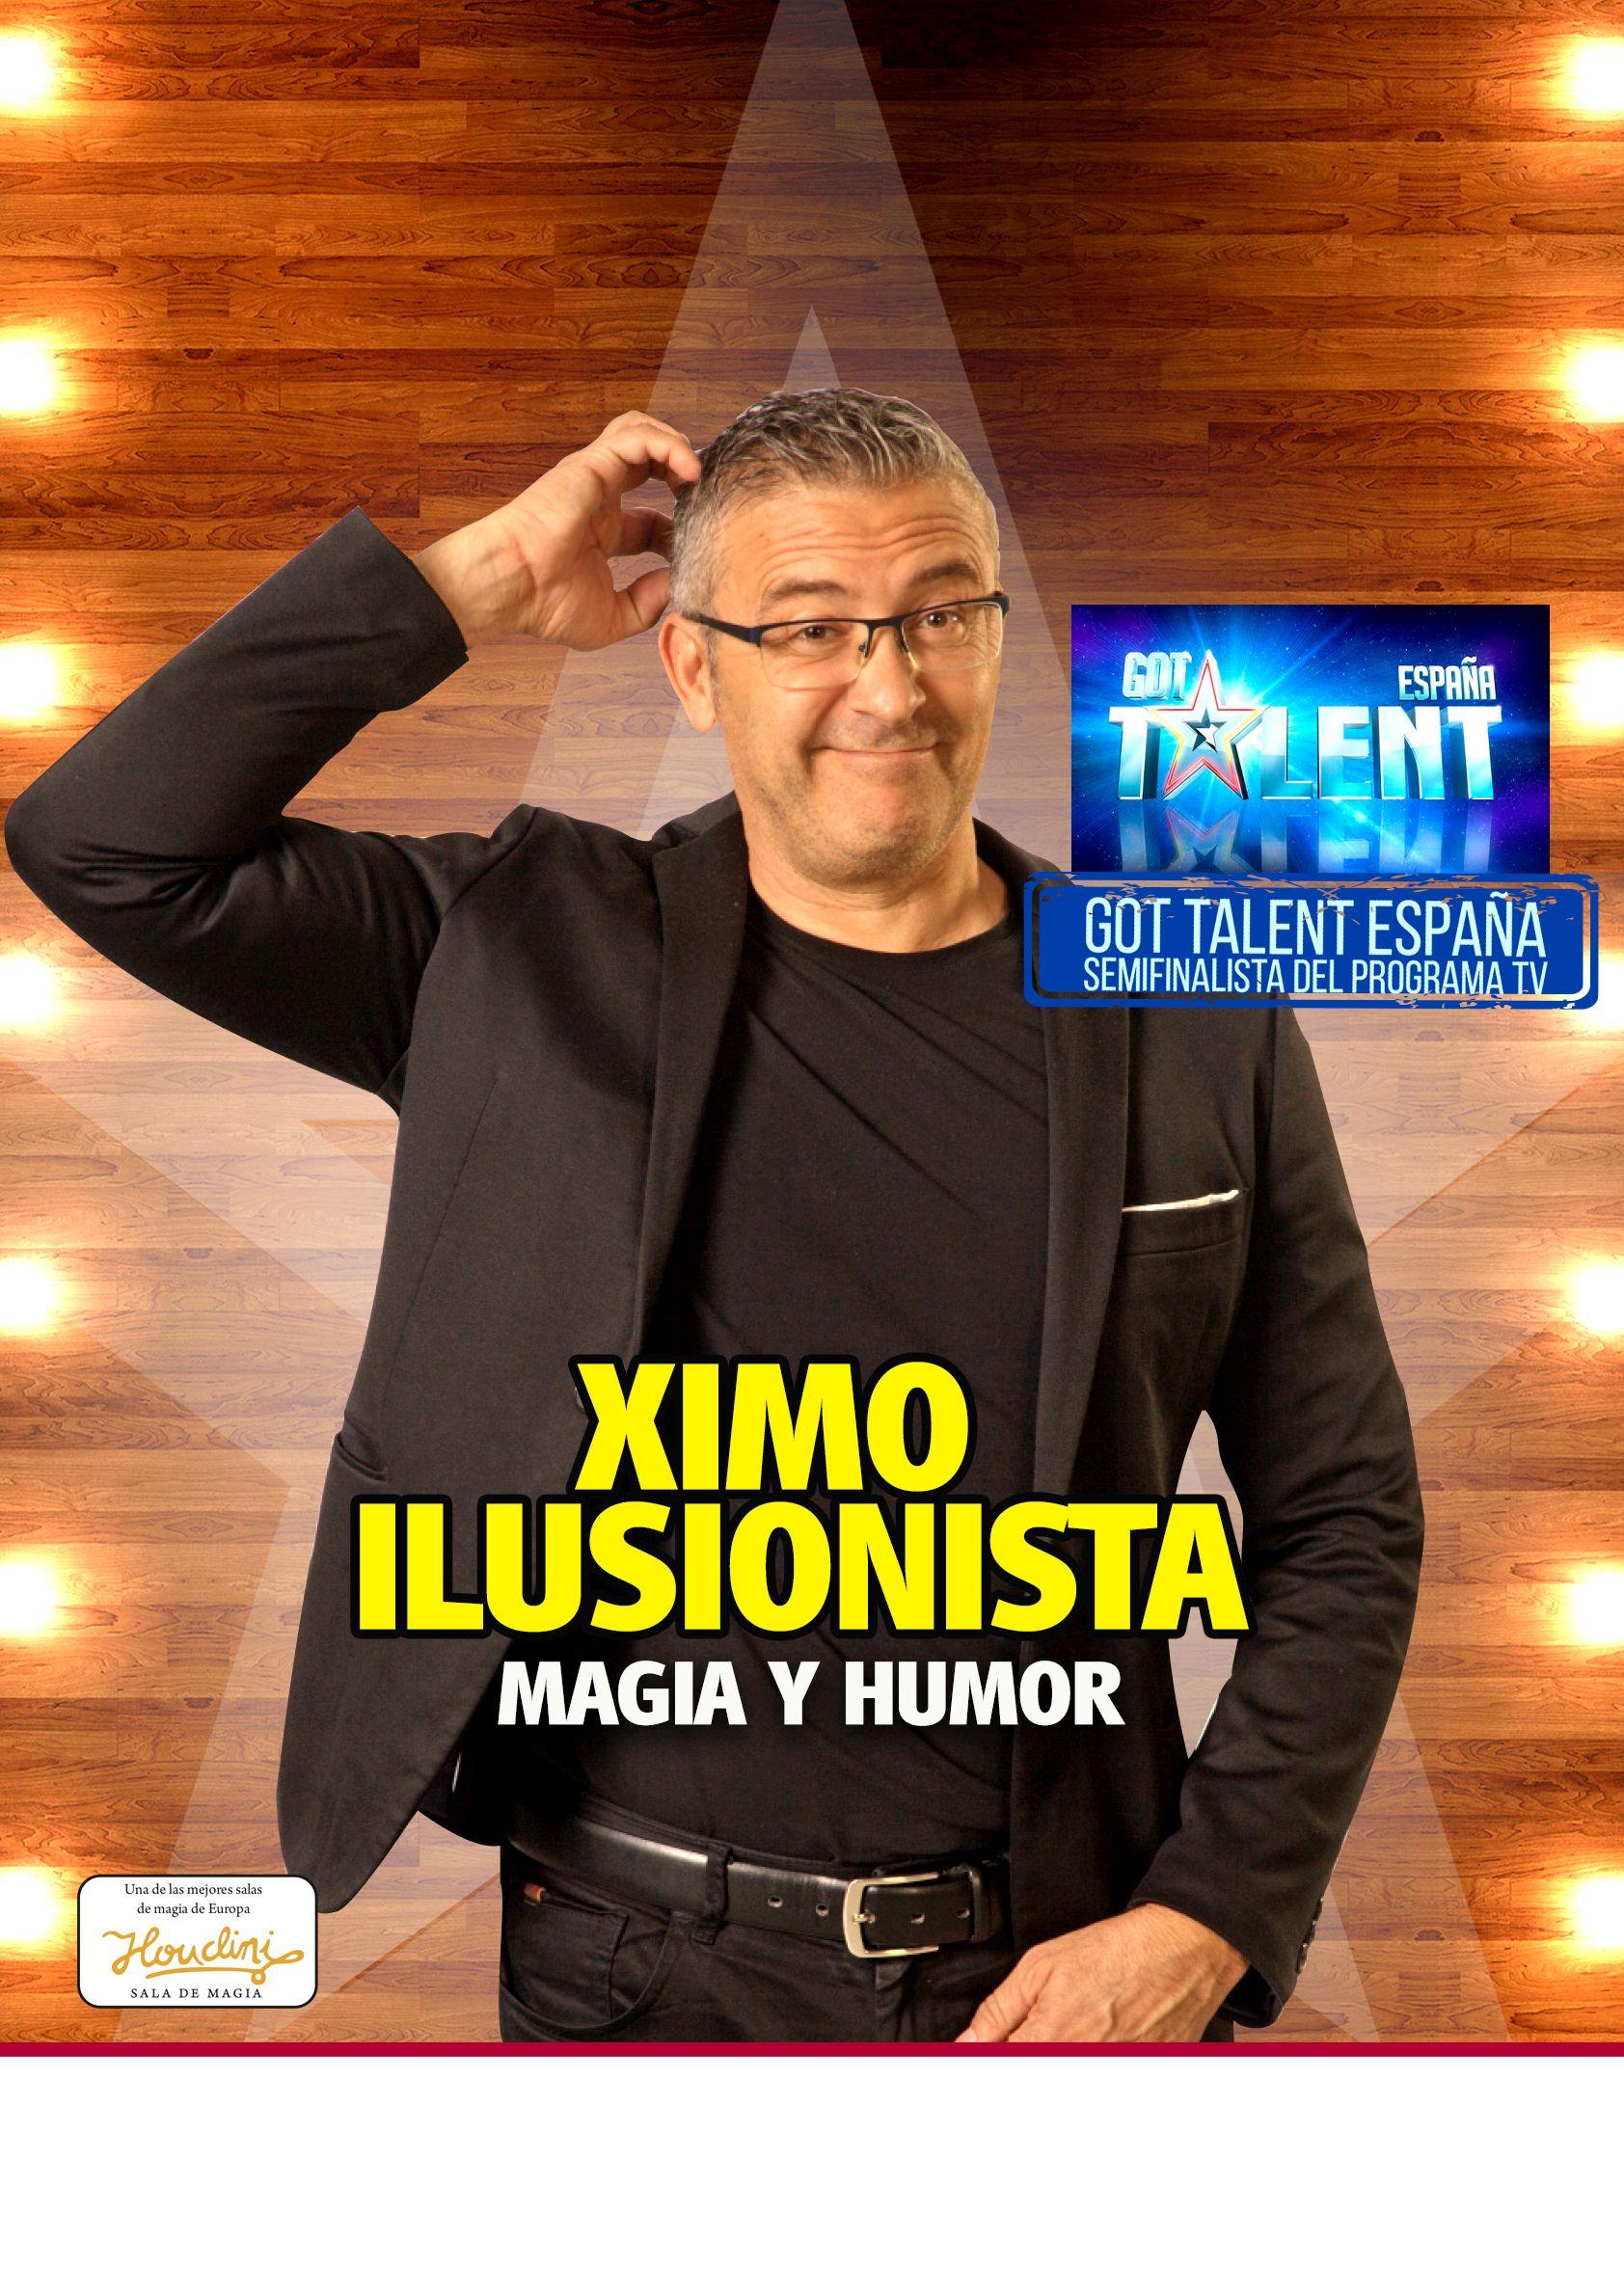 Ximo Ilusionista